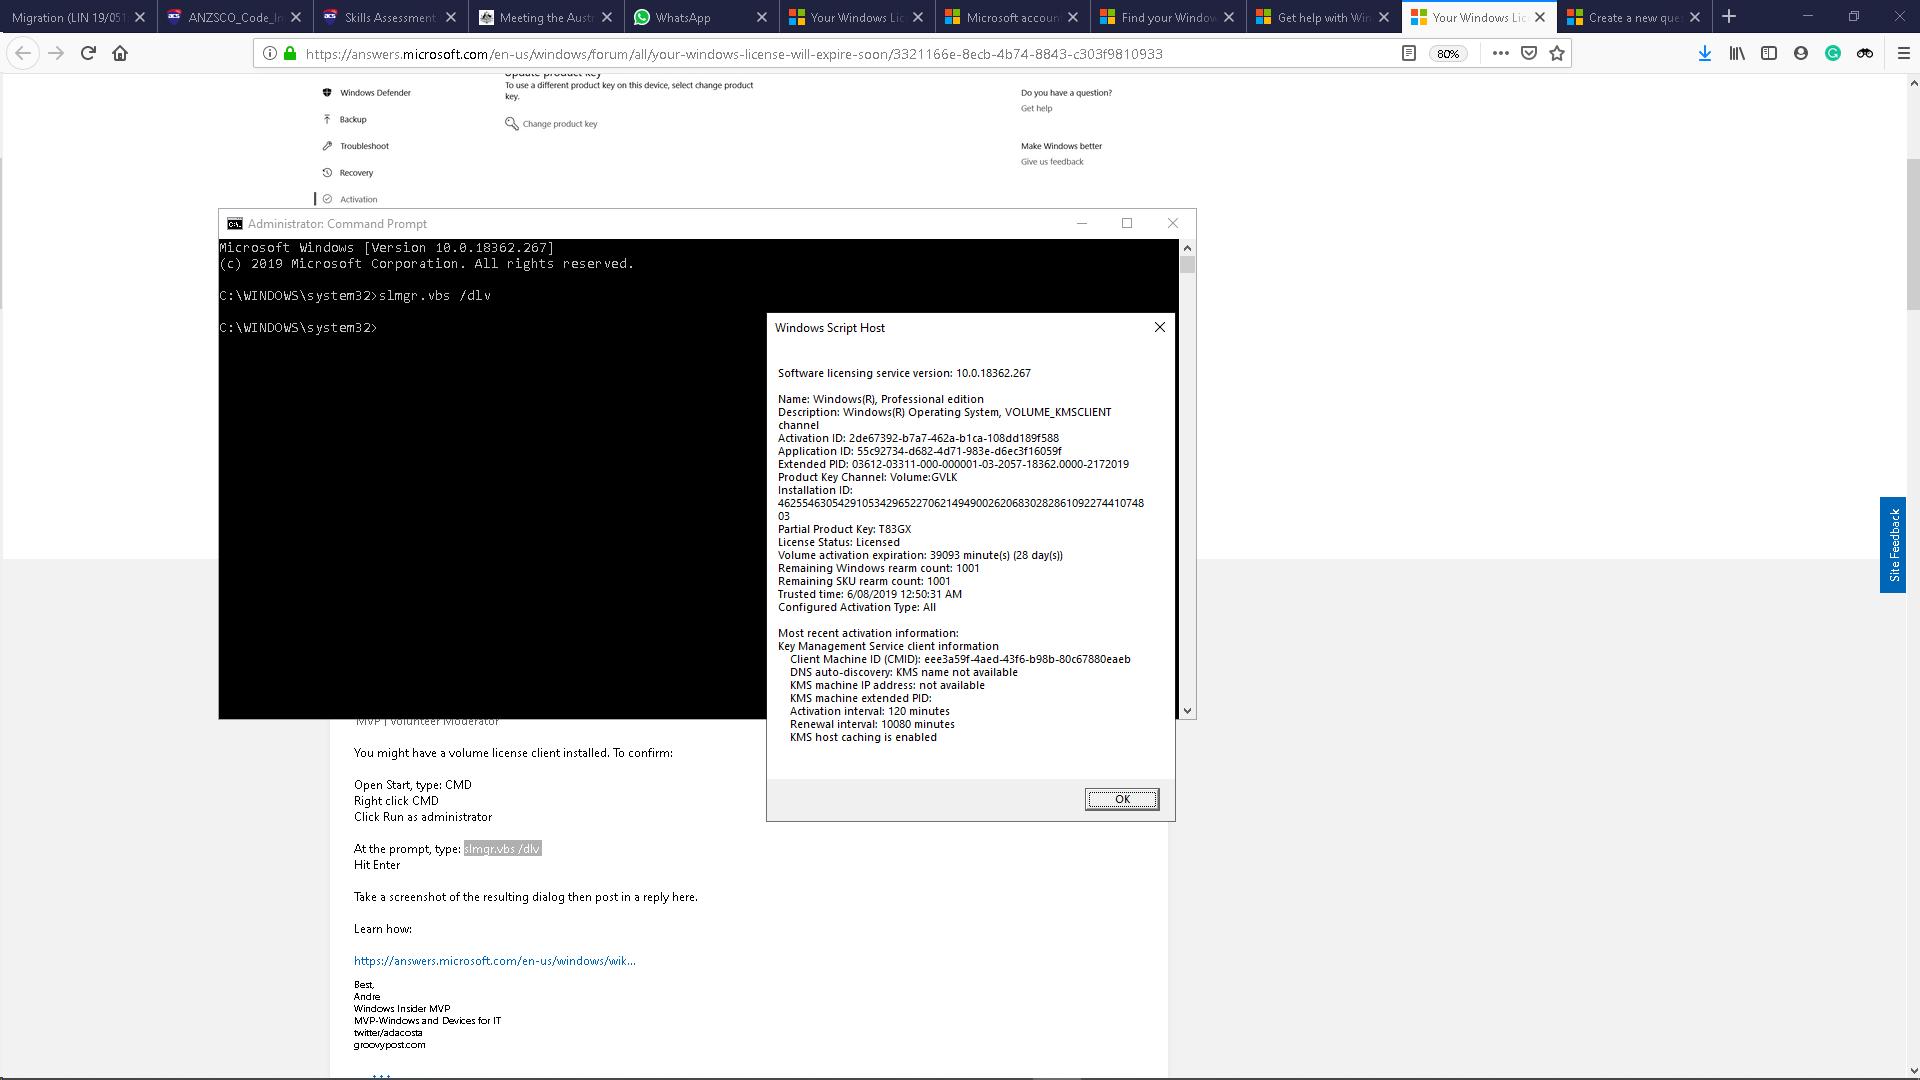 Your Windows License Will Expire Soon b1566df5-3dbf-462b-870e-1544c213ebcc?upload=true.png